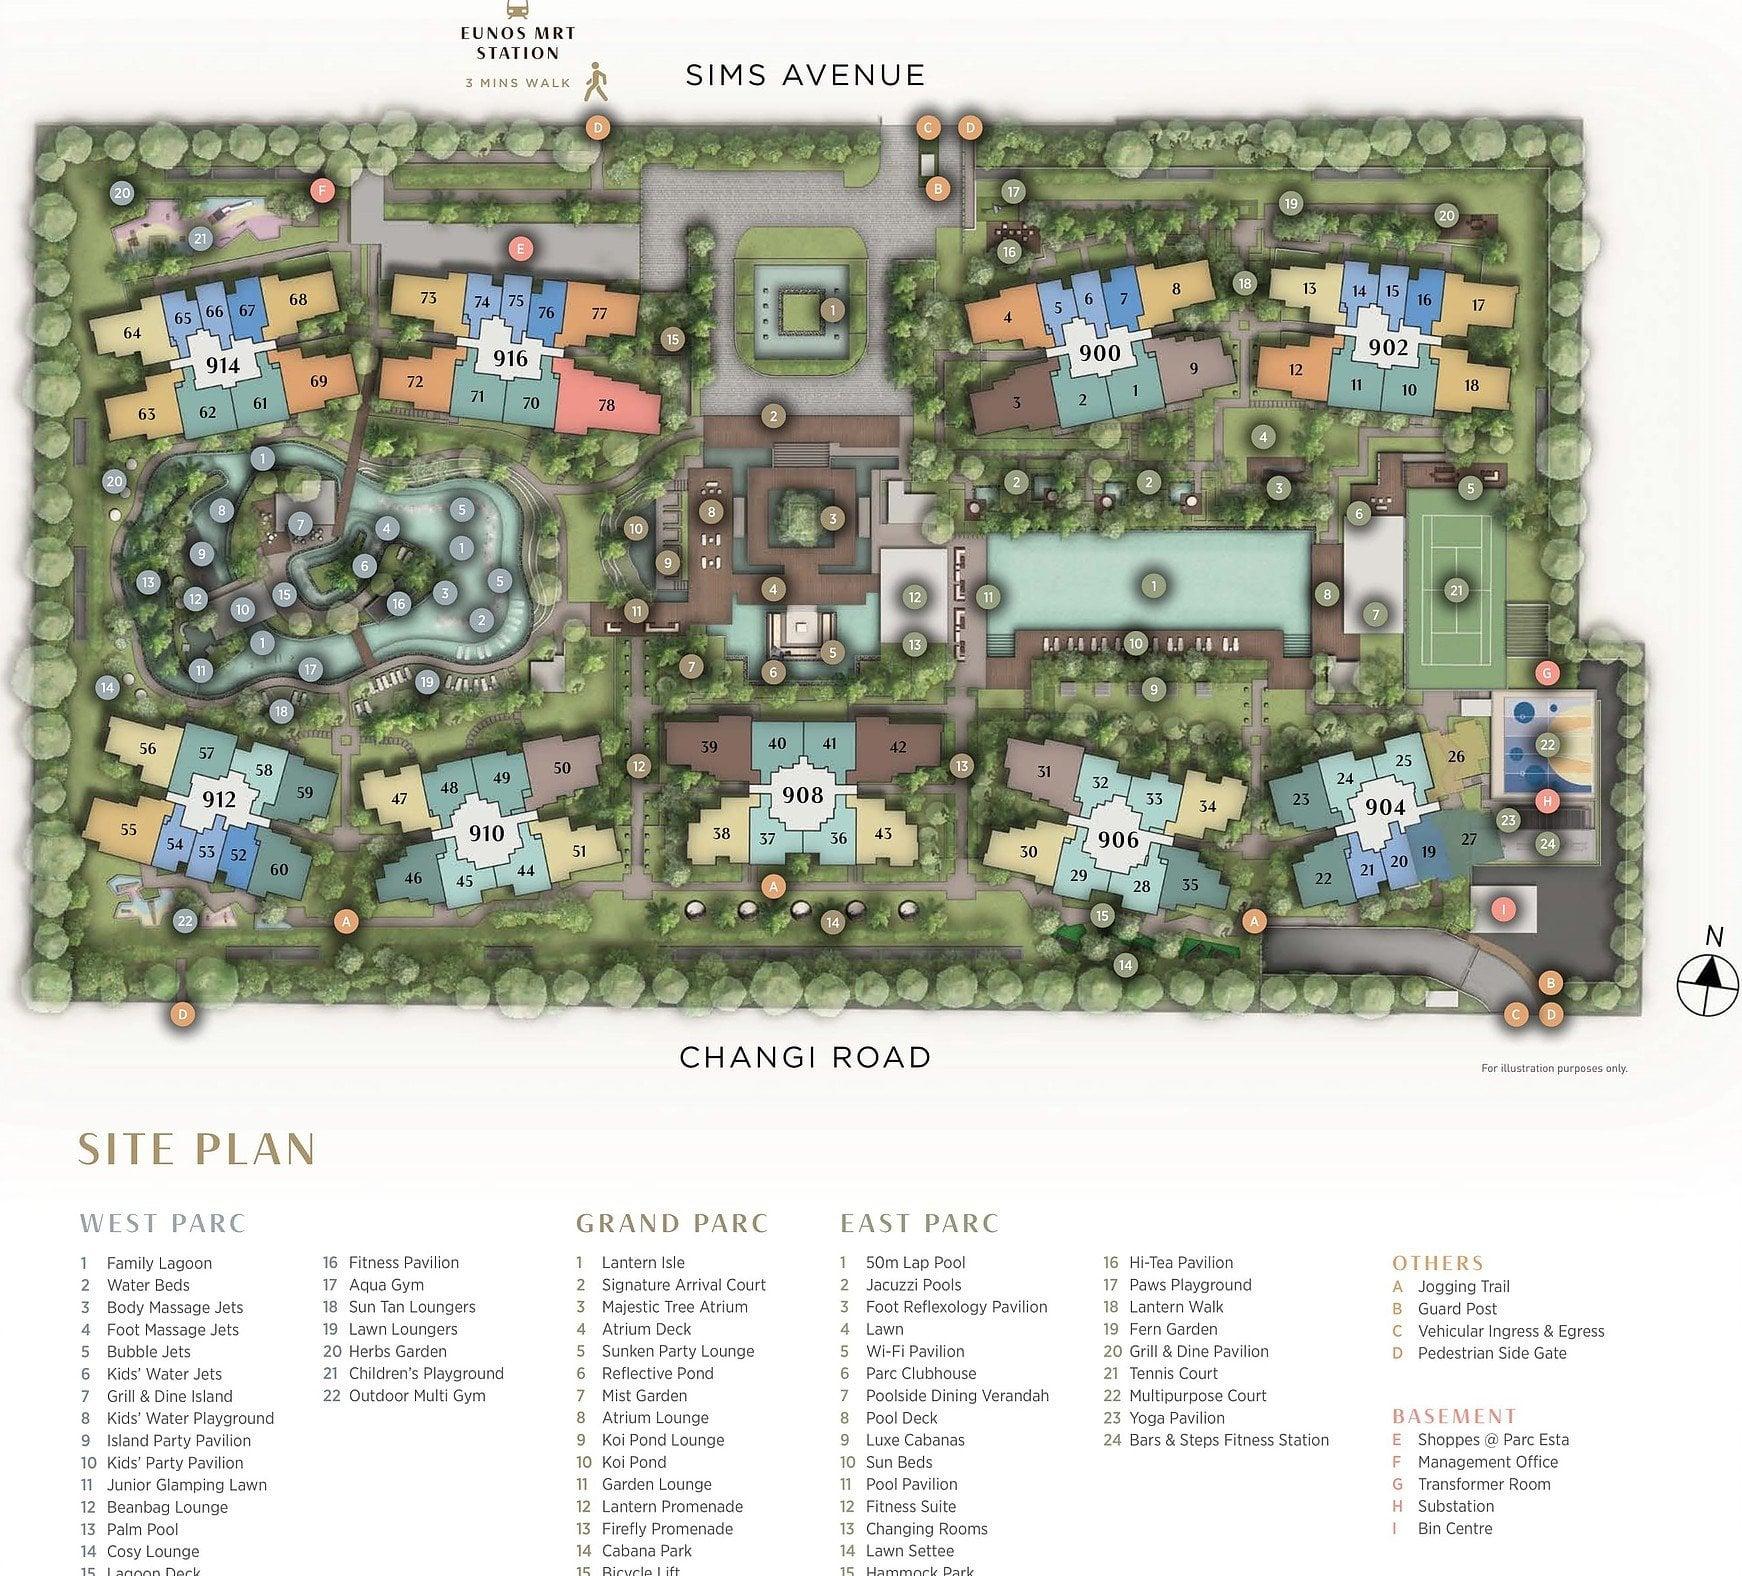 Parc Esta Eunos Site Plan